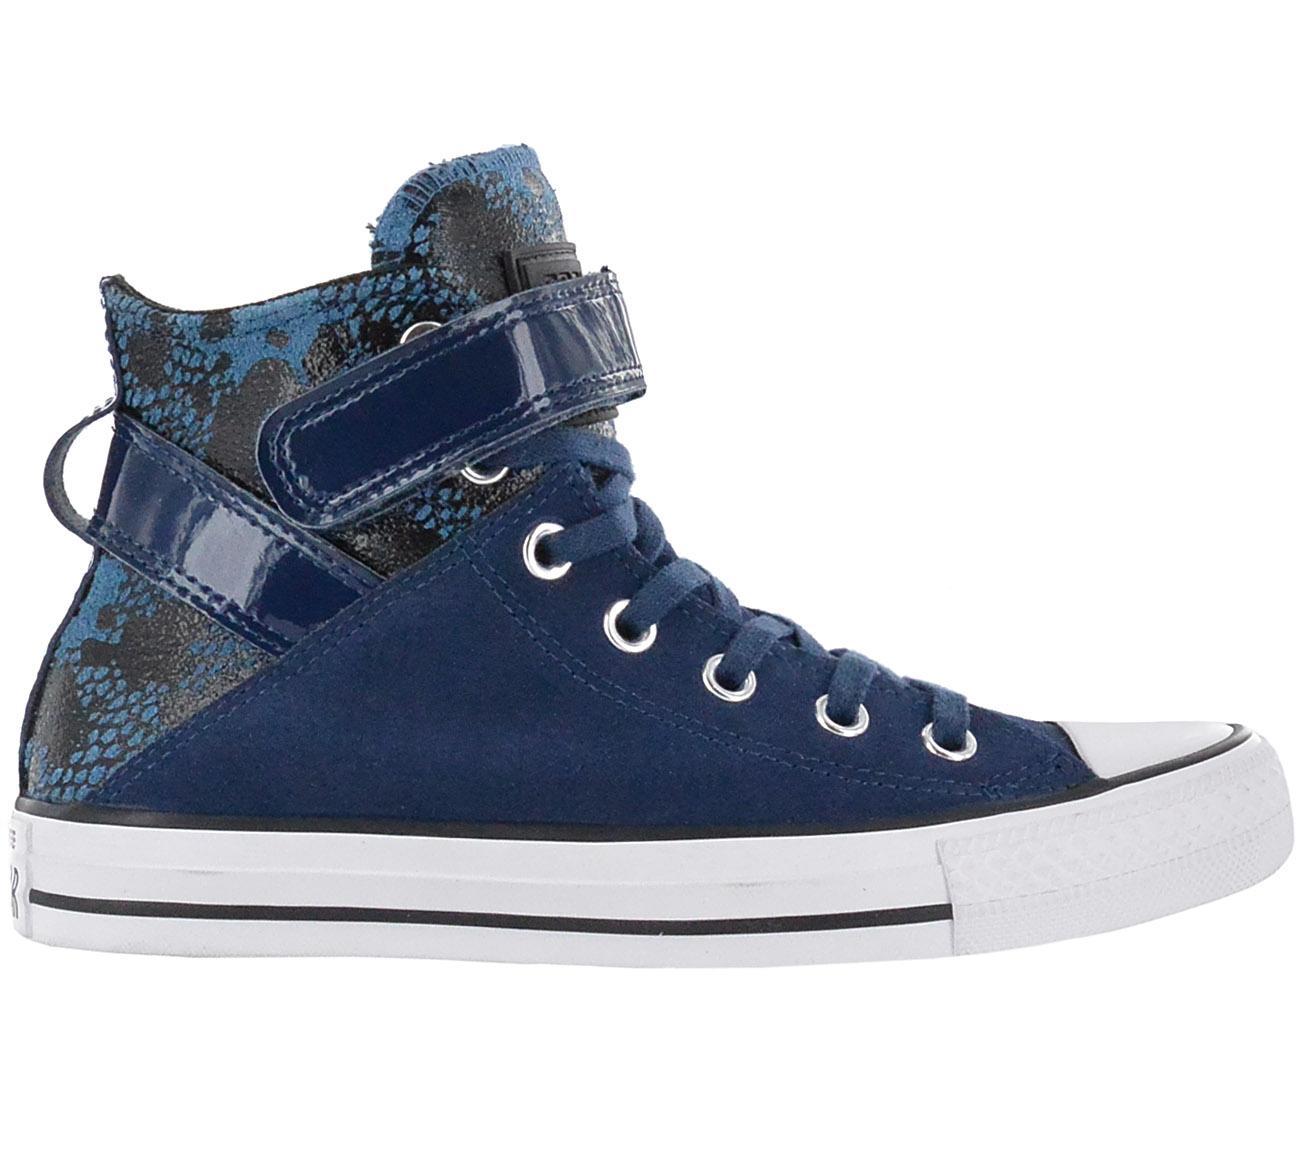 converse damen sneaker chucks all star taylor ct brea hi. Black Bedroom Furniture Sets. Home Design Ideas